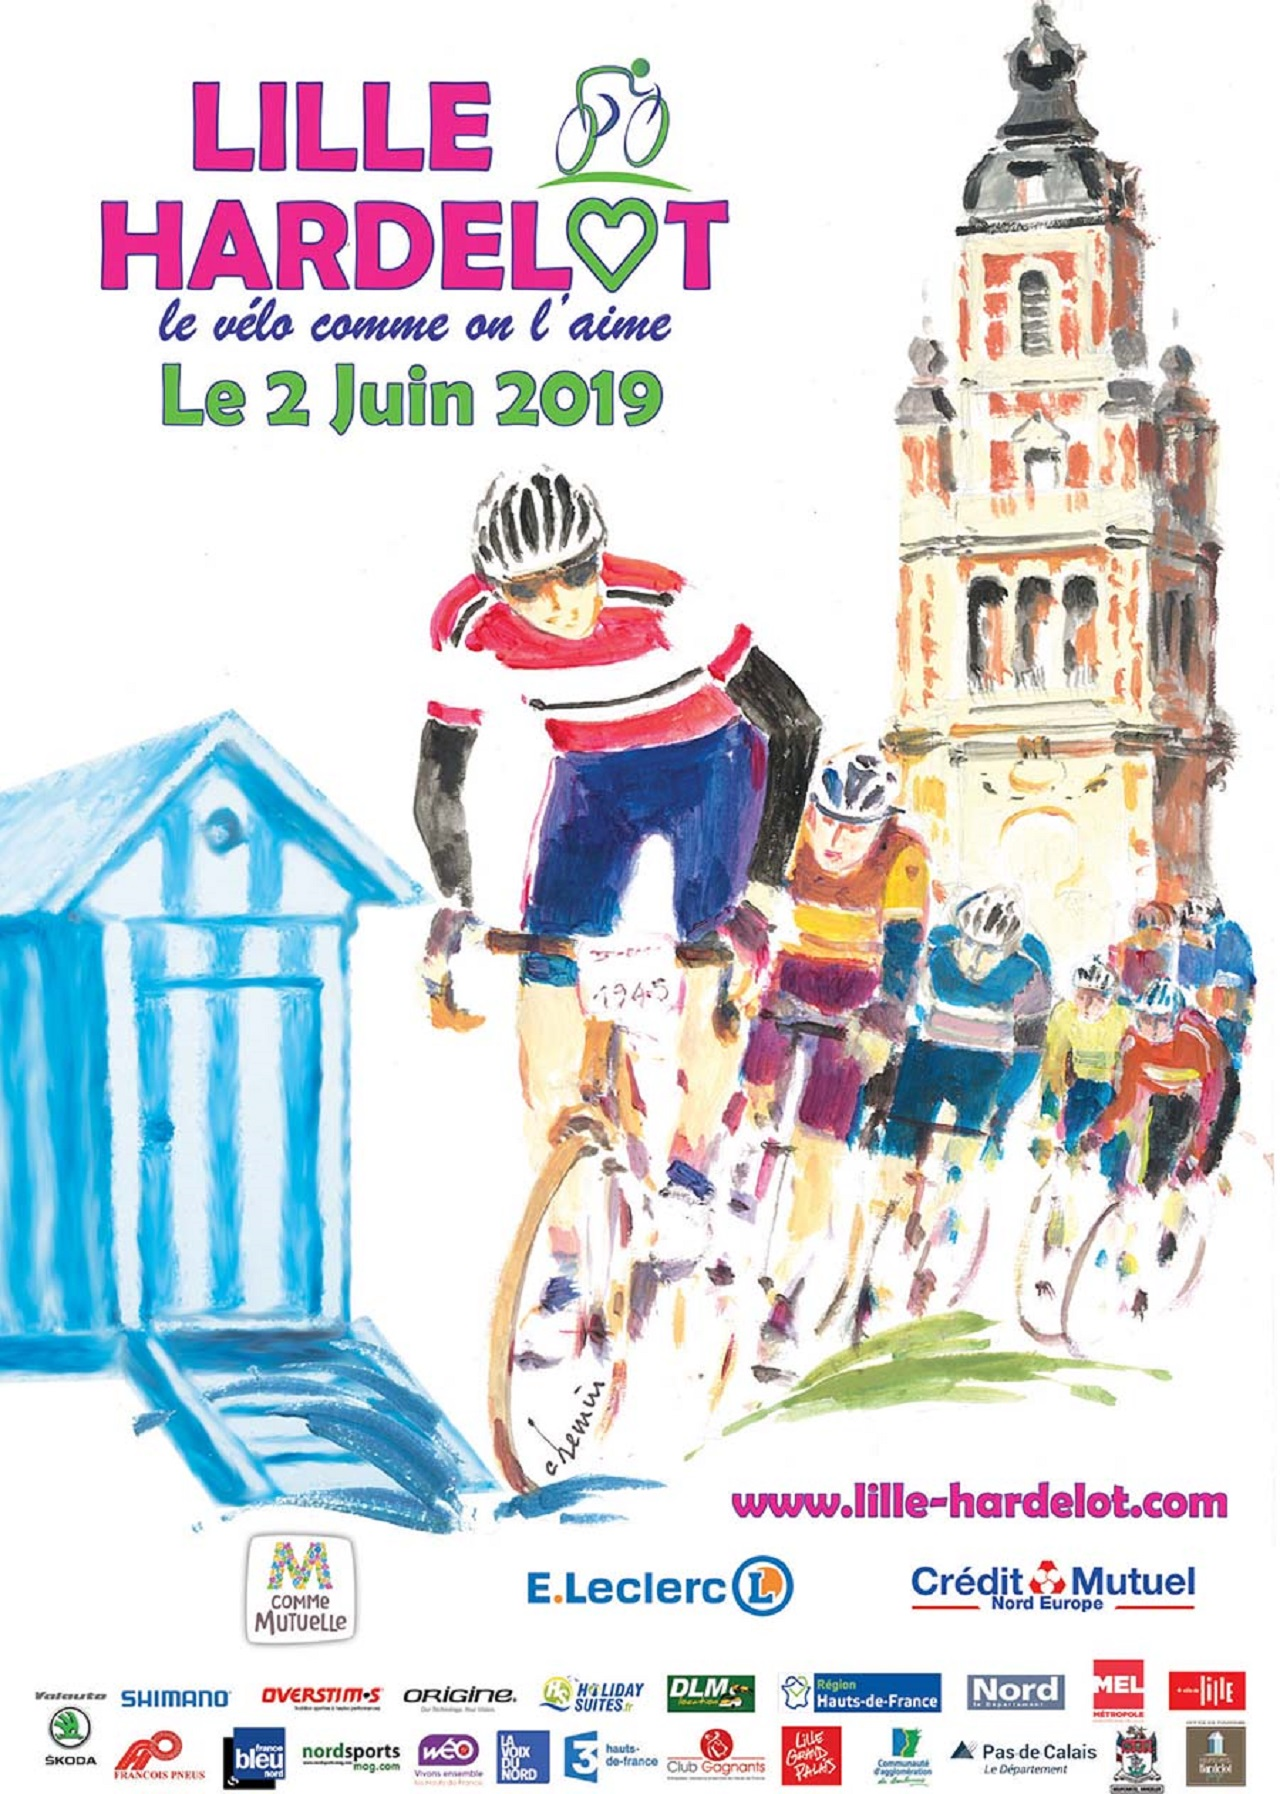 Randonnée cyclotouriste Lille Harledot